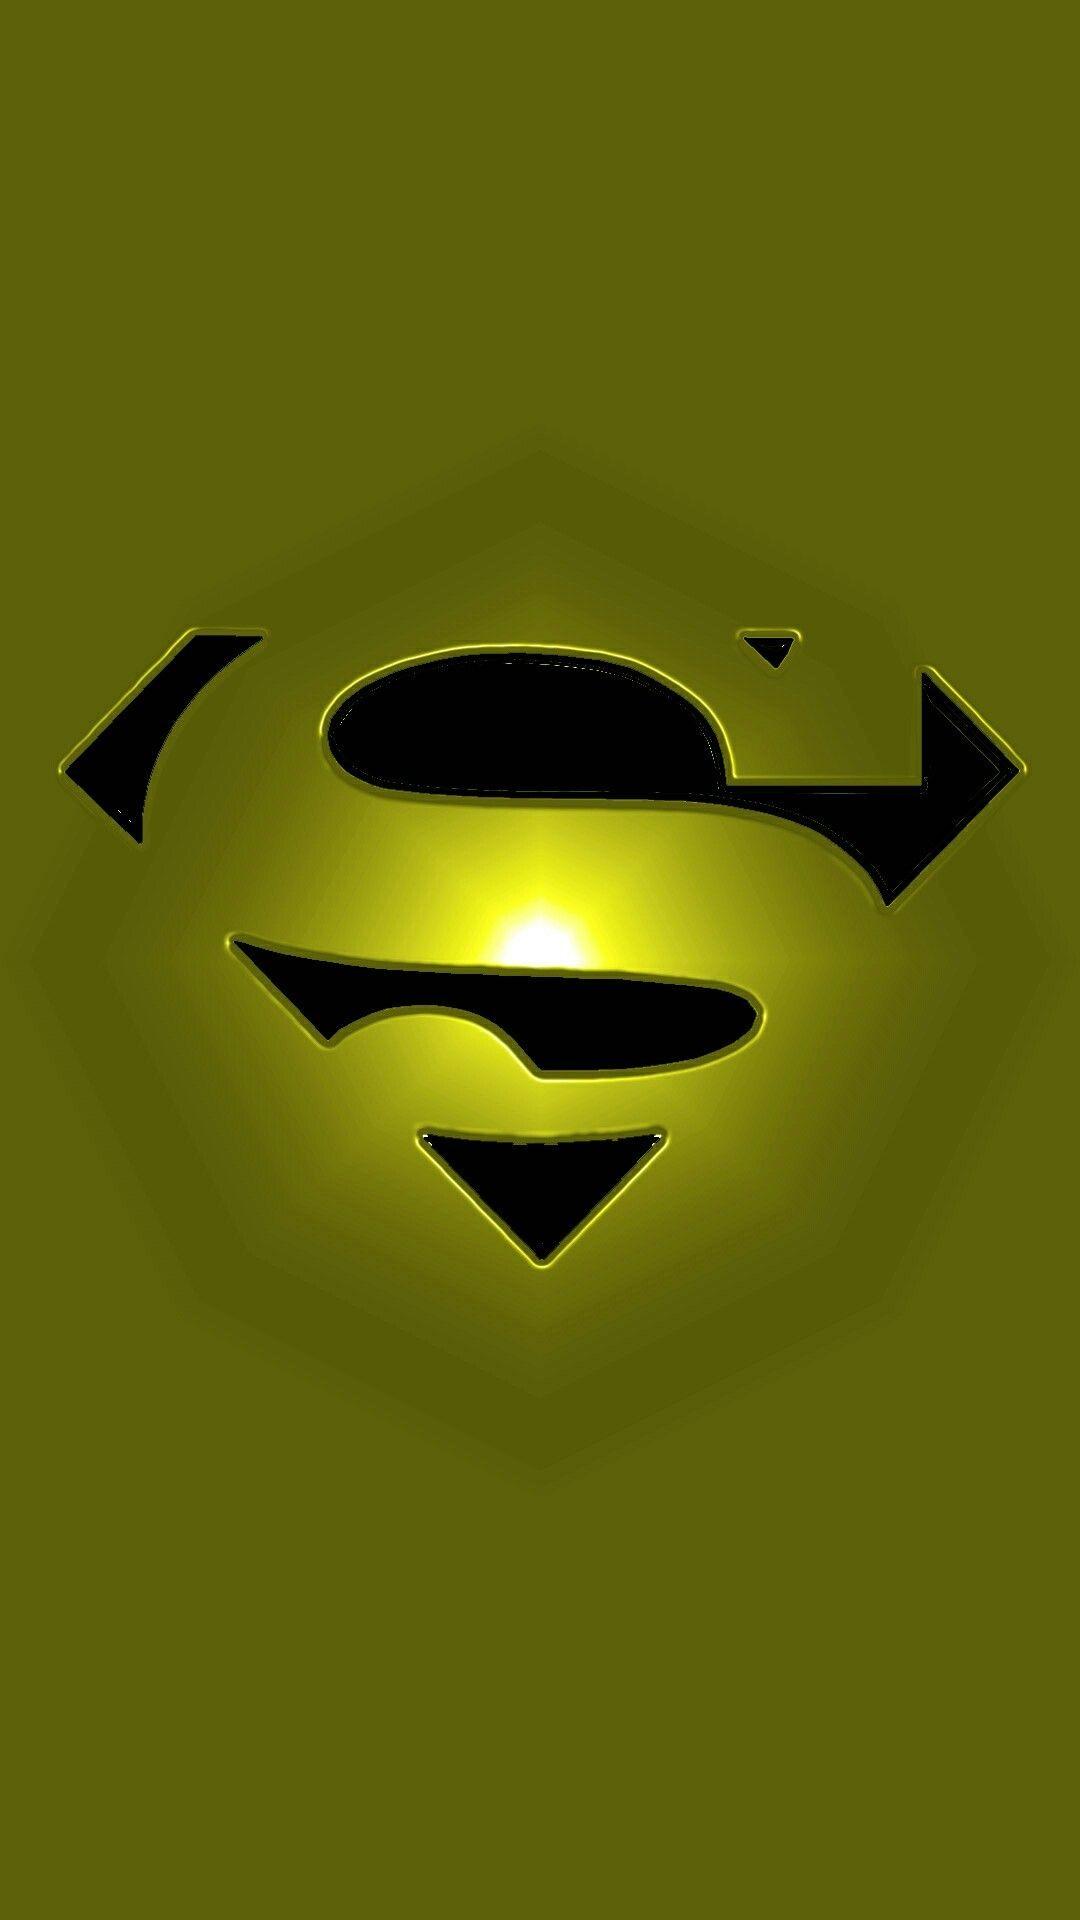 Rahul Superman Symbol, Logo Superman, Batman And Superman, - S De Superman Verde - HD Wallpaper